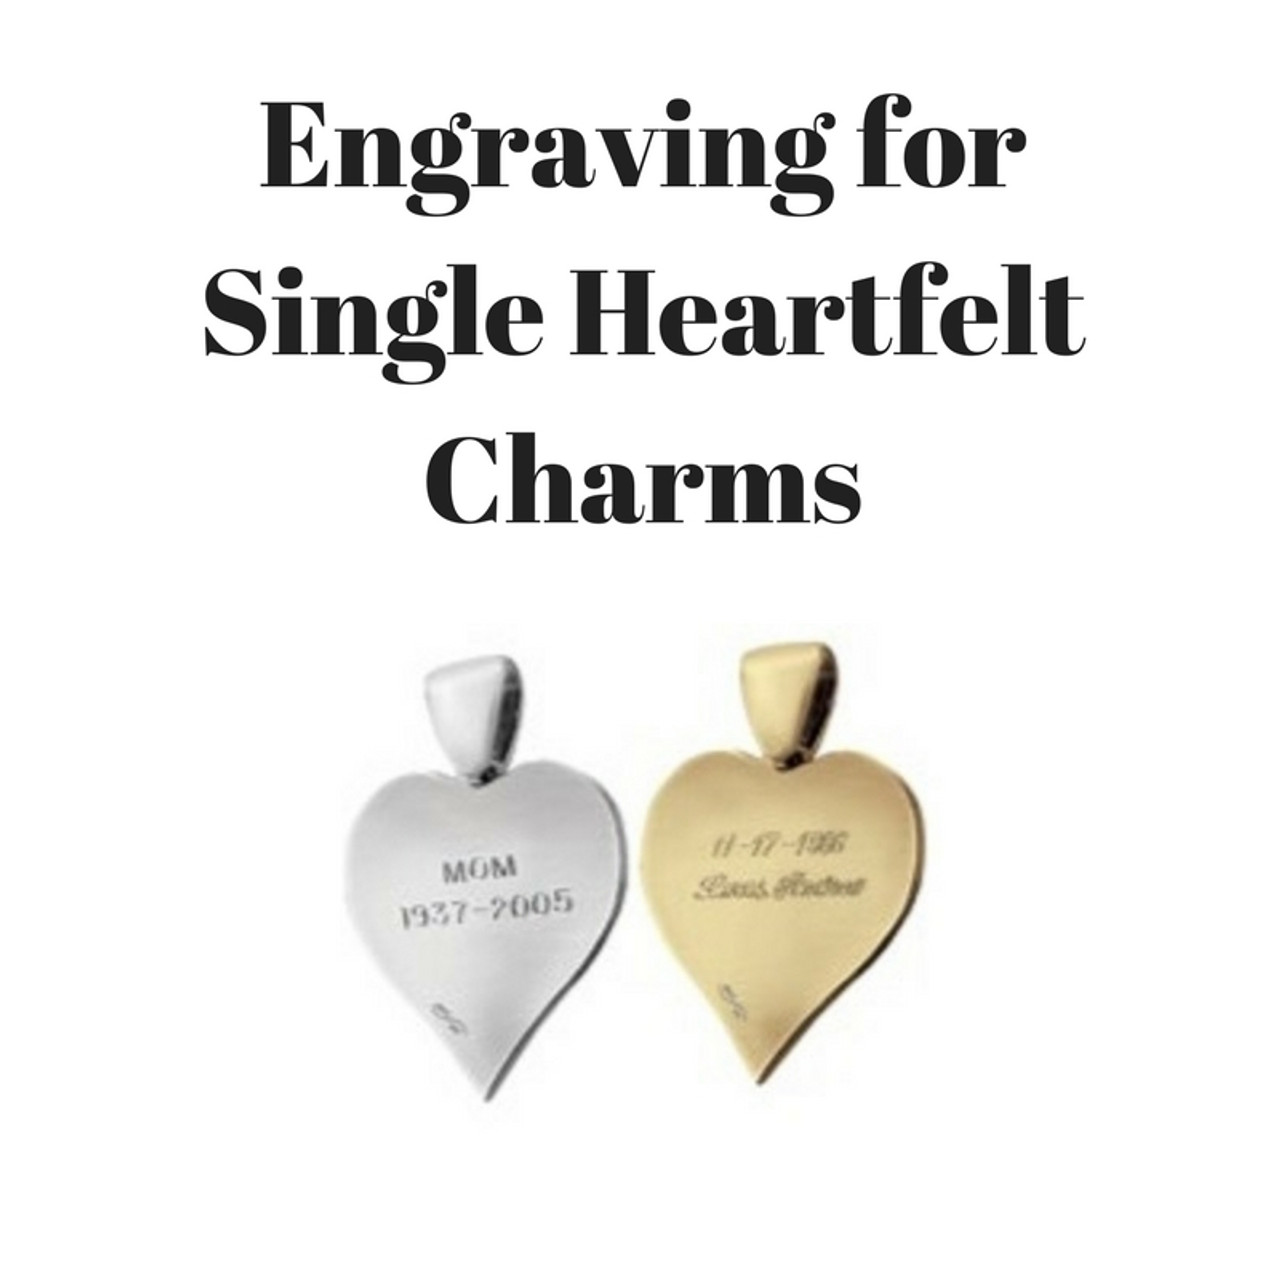 Engraving for Single Heartfelt Charms (BACK)